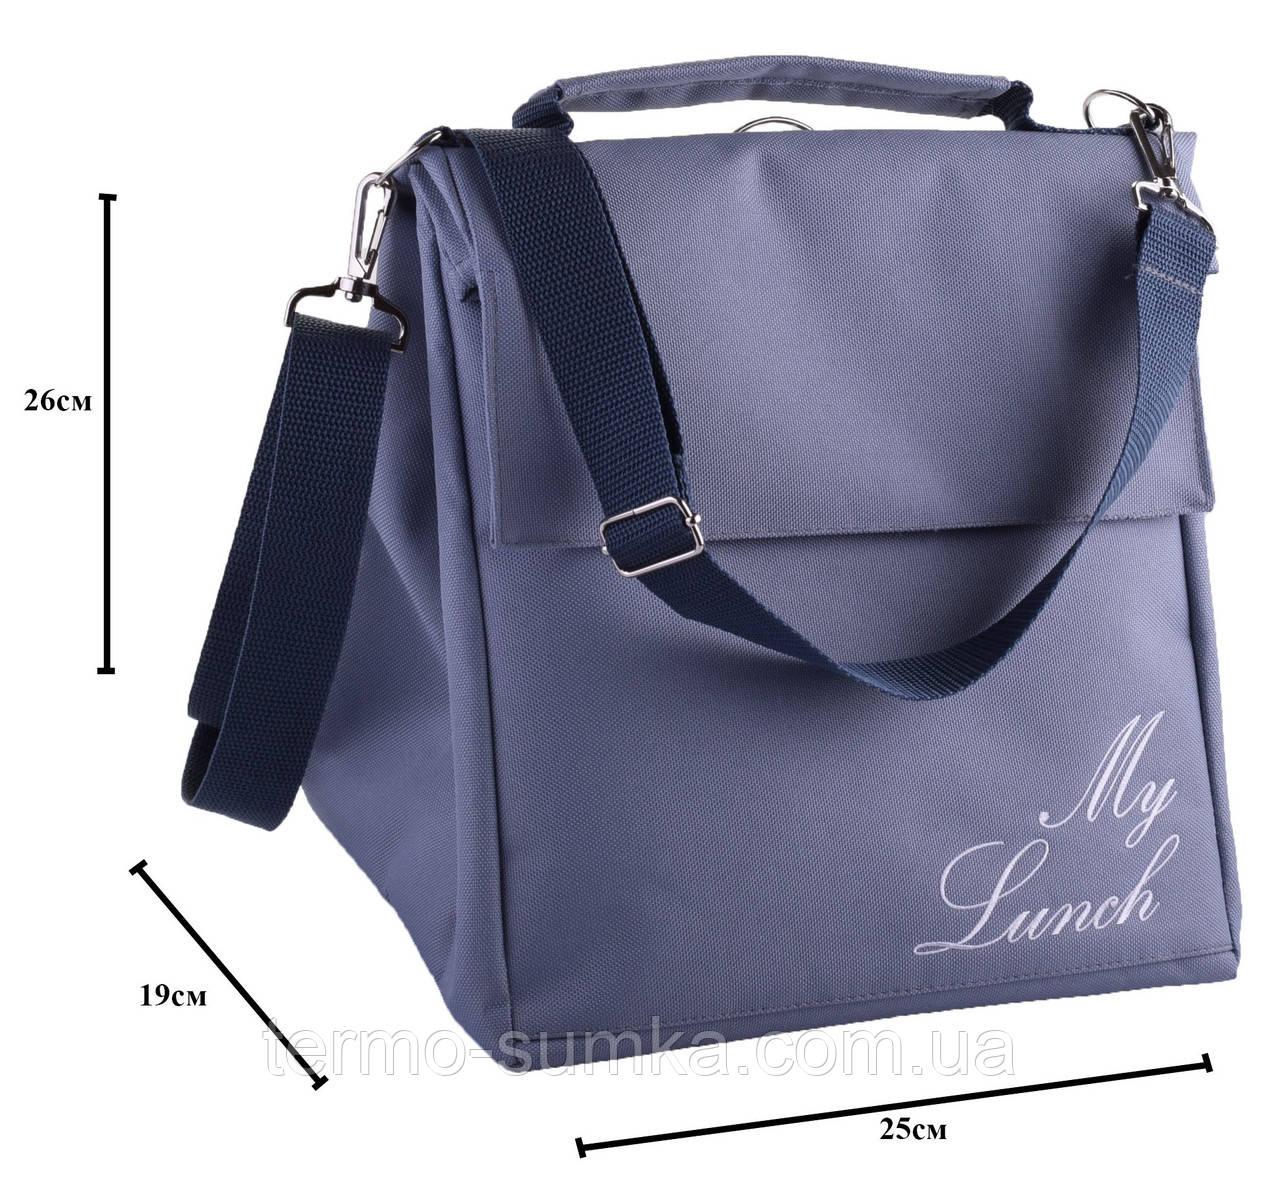 Термосумка - рюкзак. Ланч бег з вишивкою My lunch. Сірий